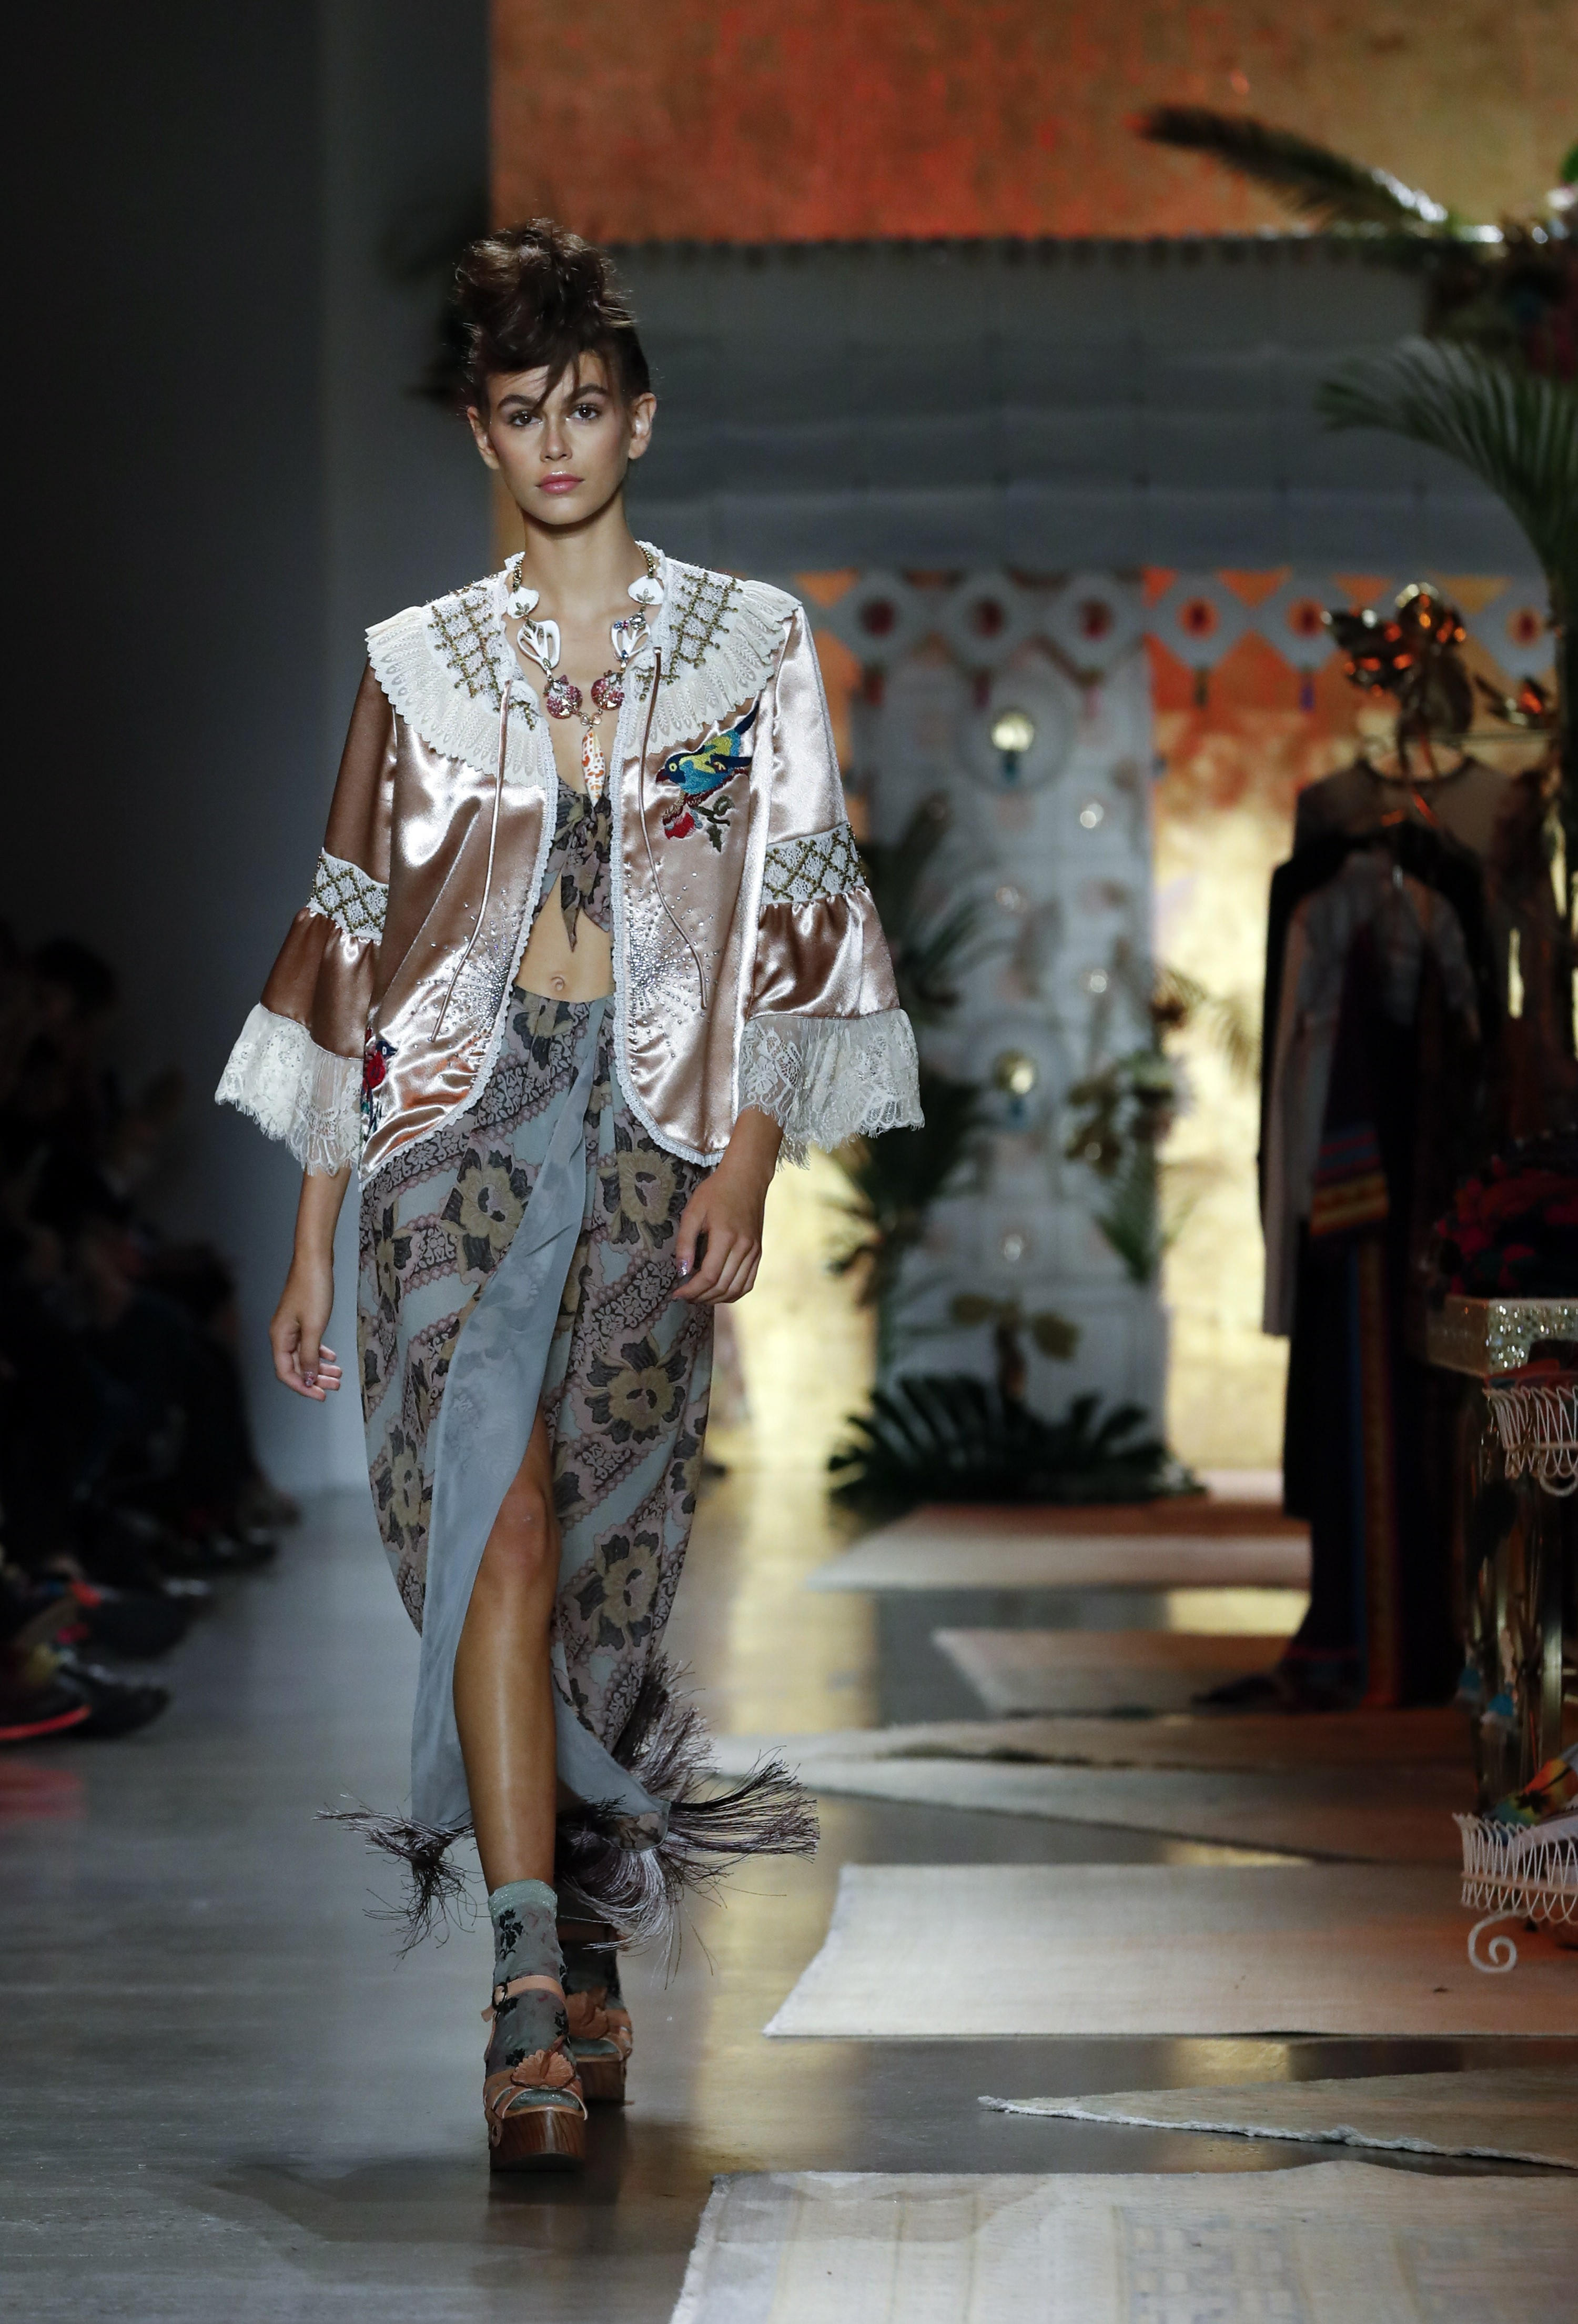 b493fa6081 10 top  takeaways  from New York Fashion Week